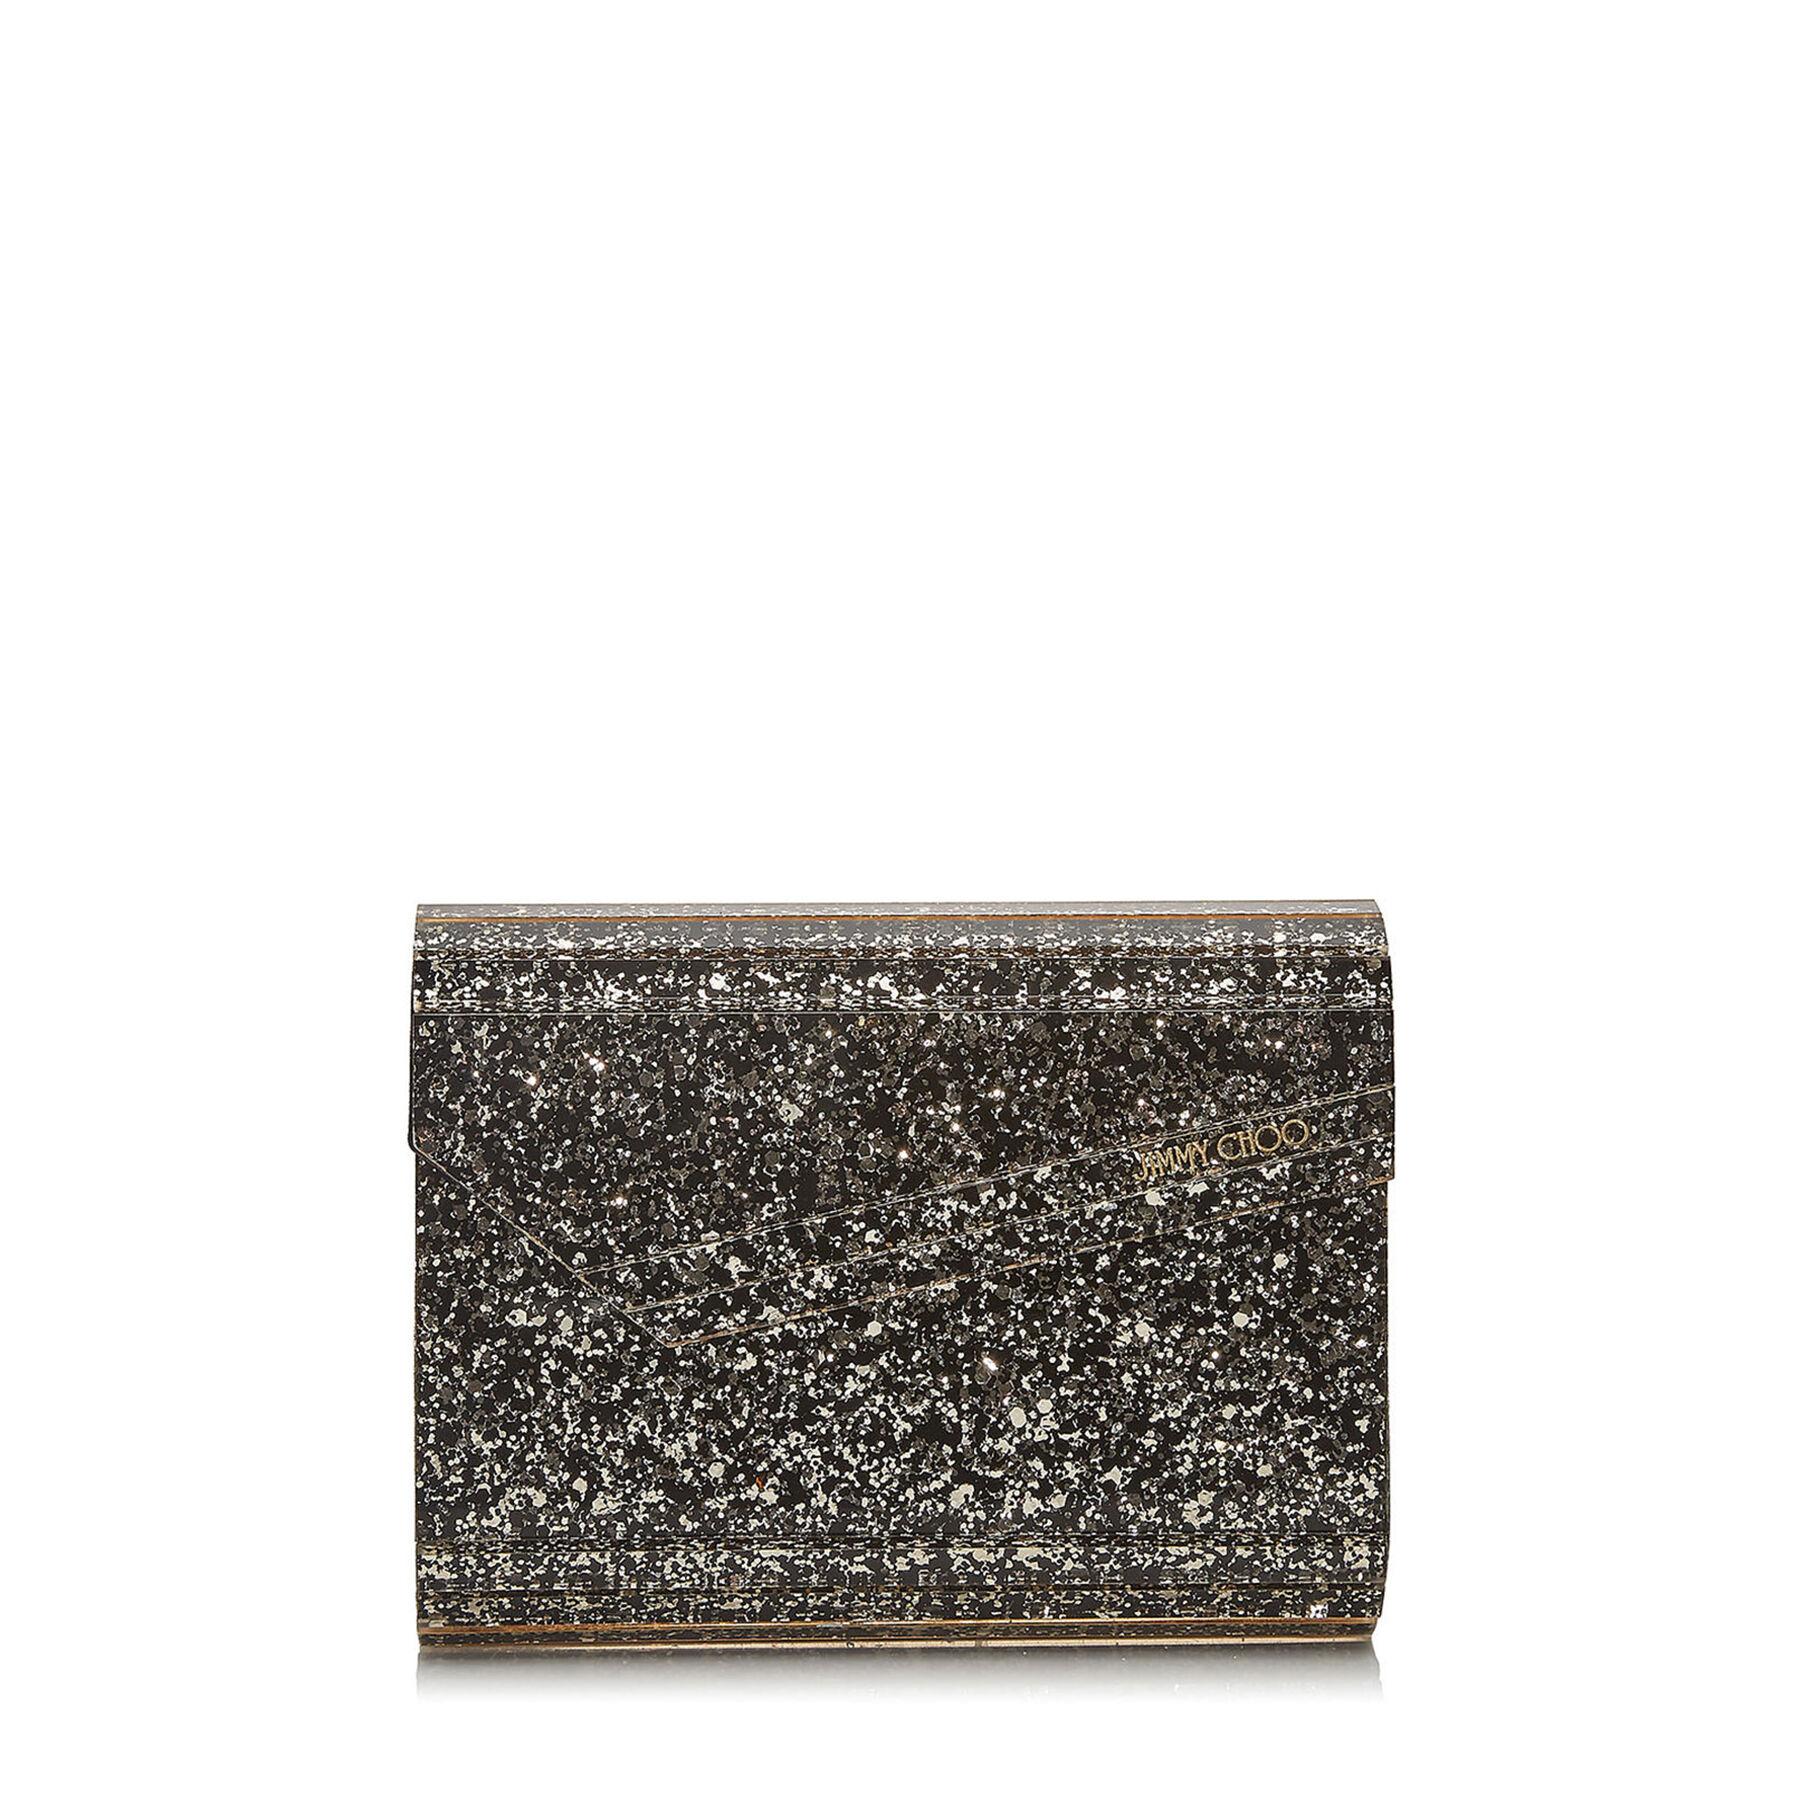 CANDY - Gold Mix Coarse Glitter Acrylic Clutch Bag